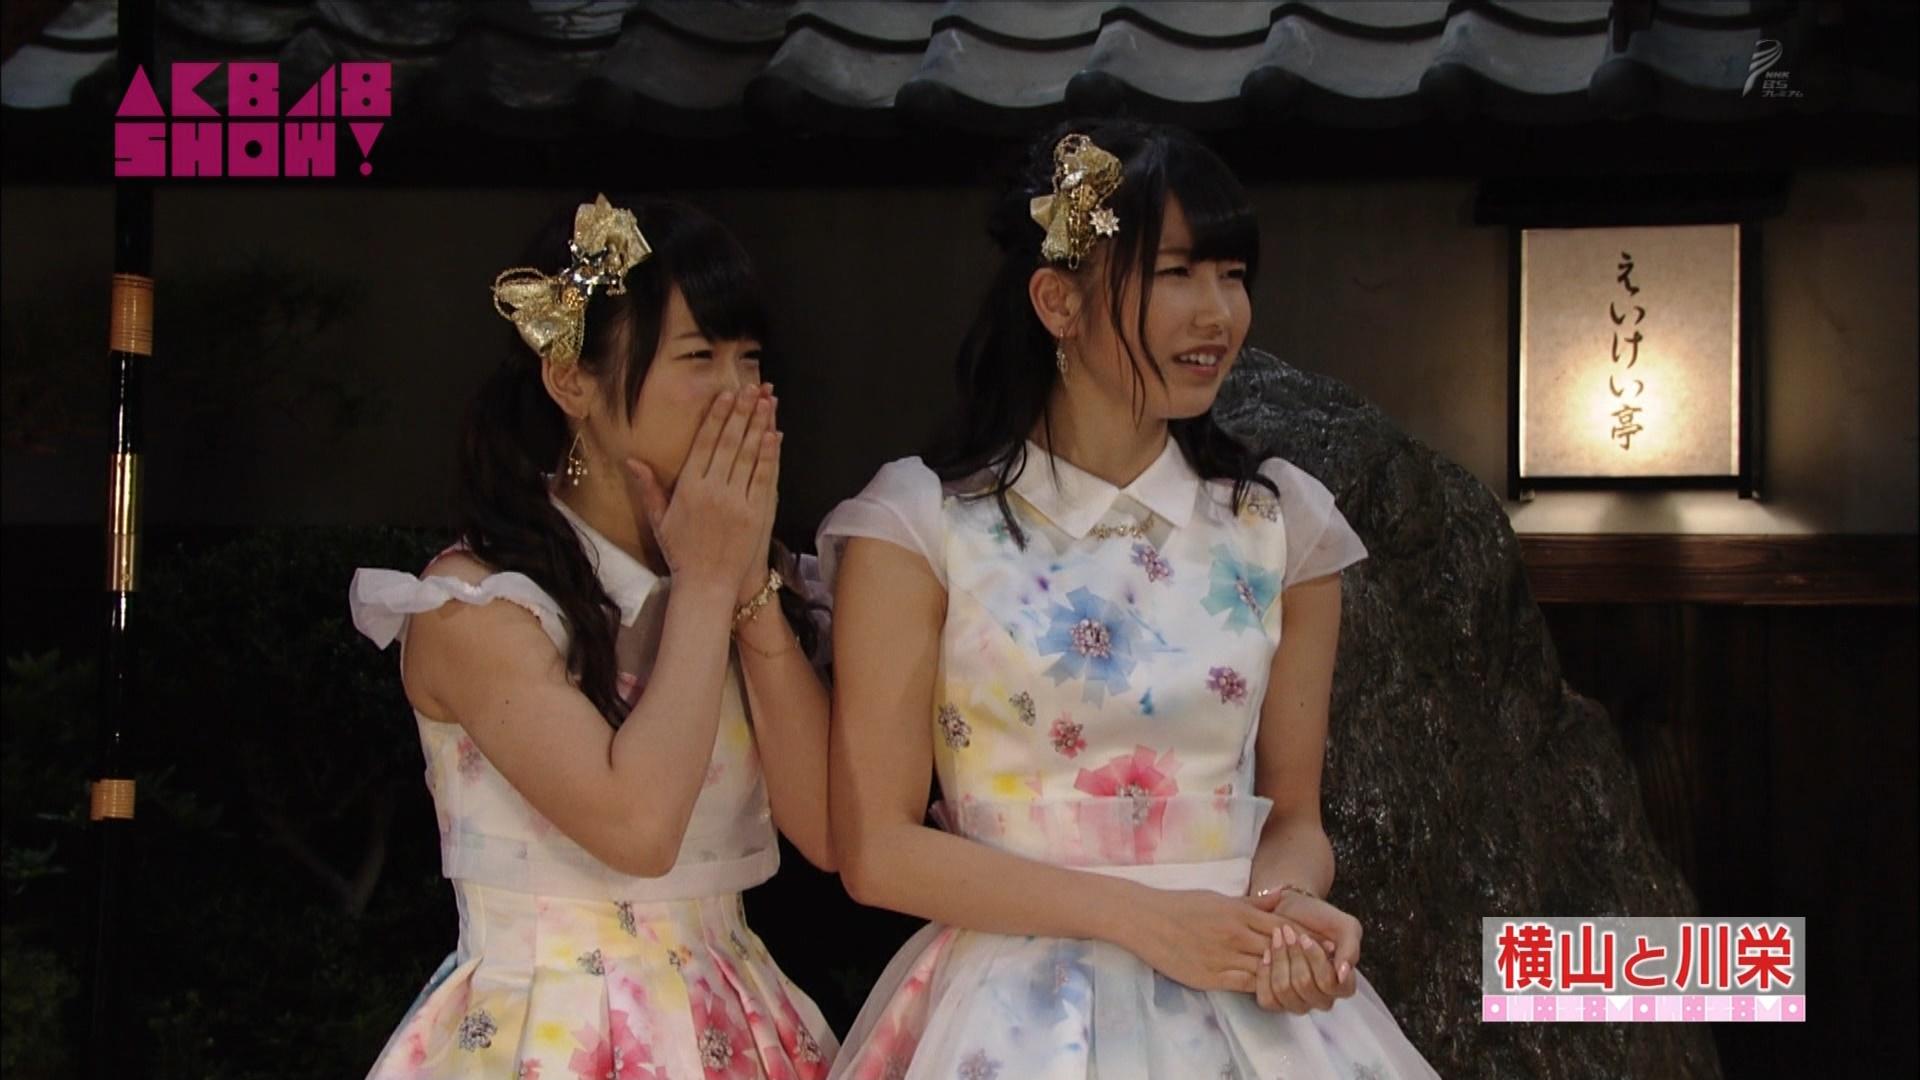 横山由依と川栄李奈 AKB48SHOW! 20140906 (9)